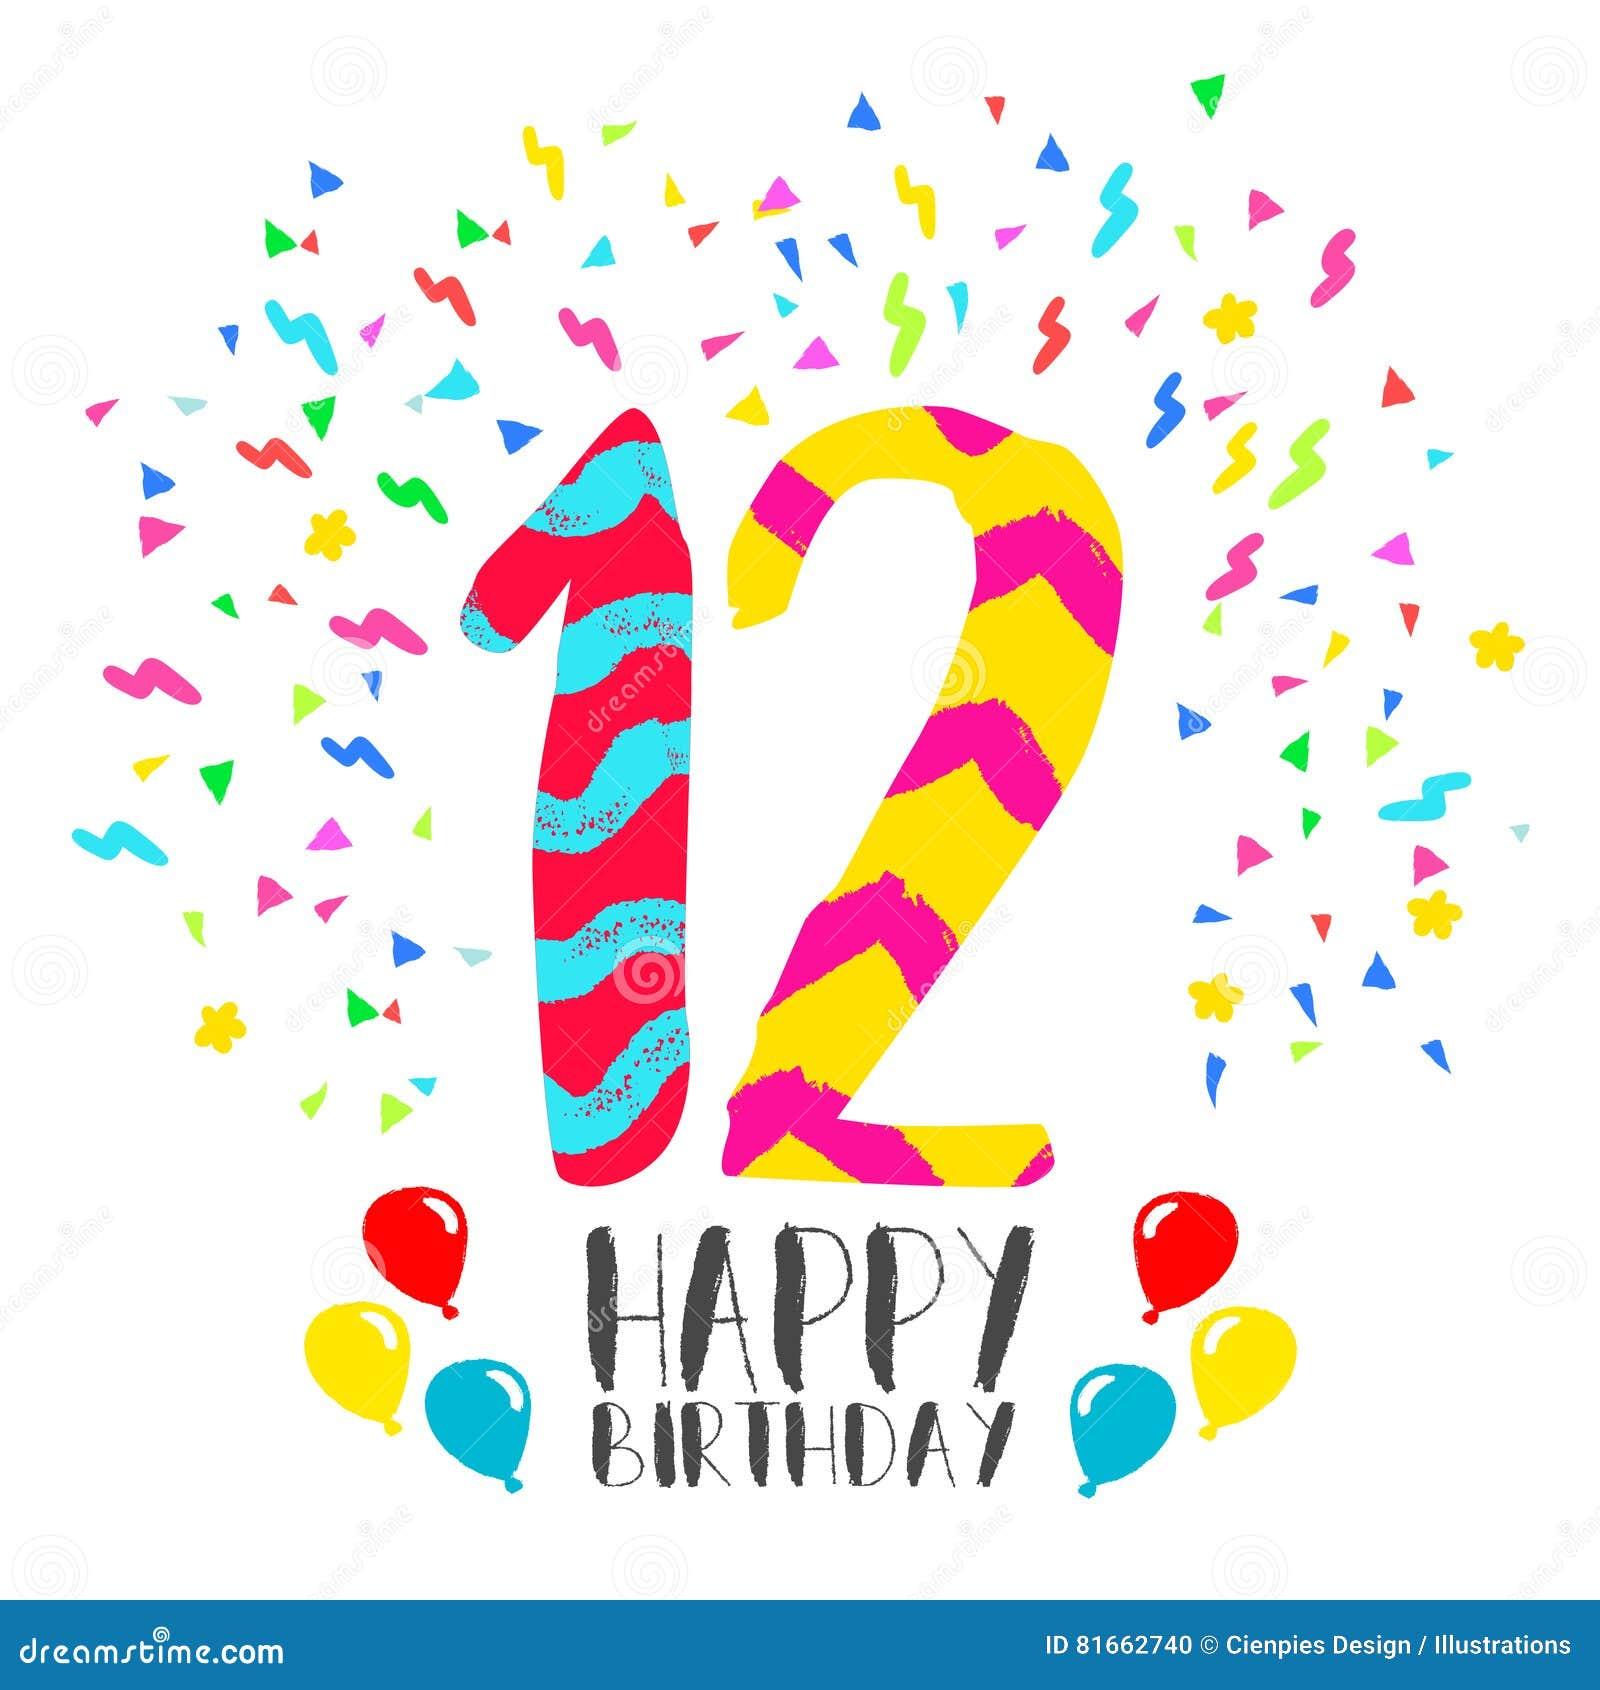 Twelve Parties: A Kid Birthday Party